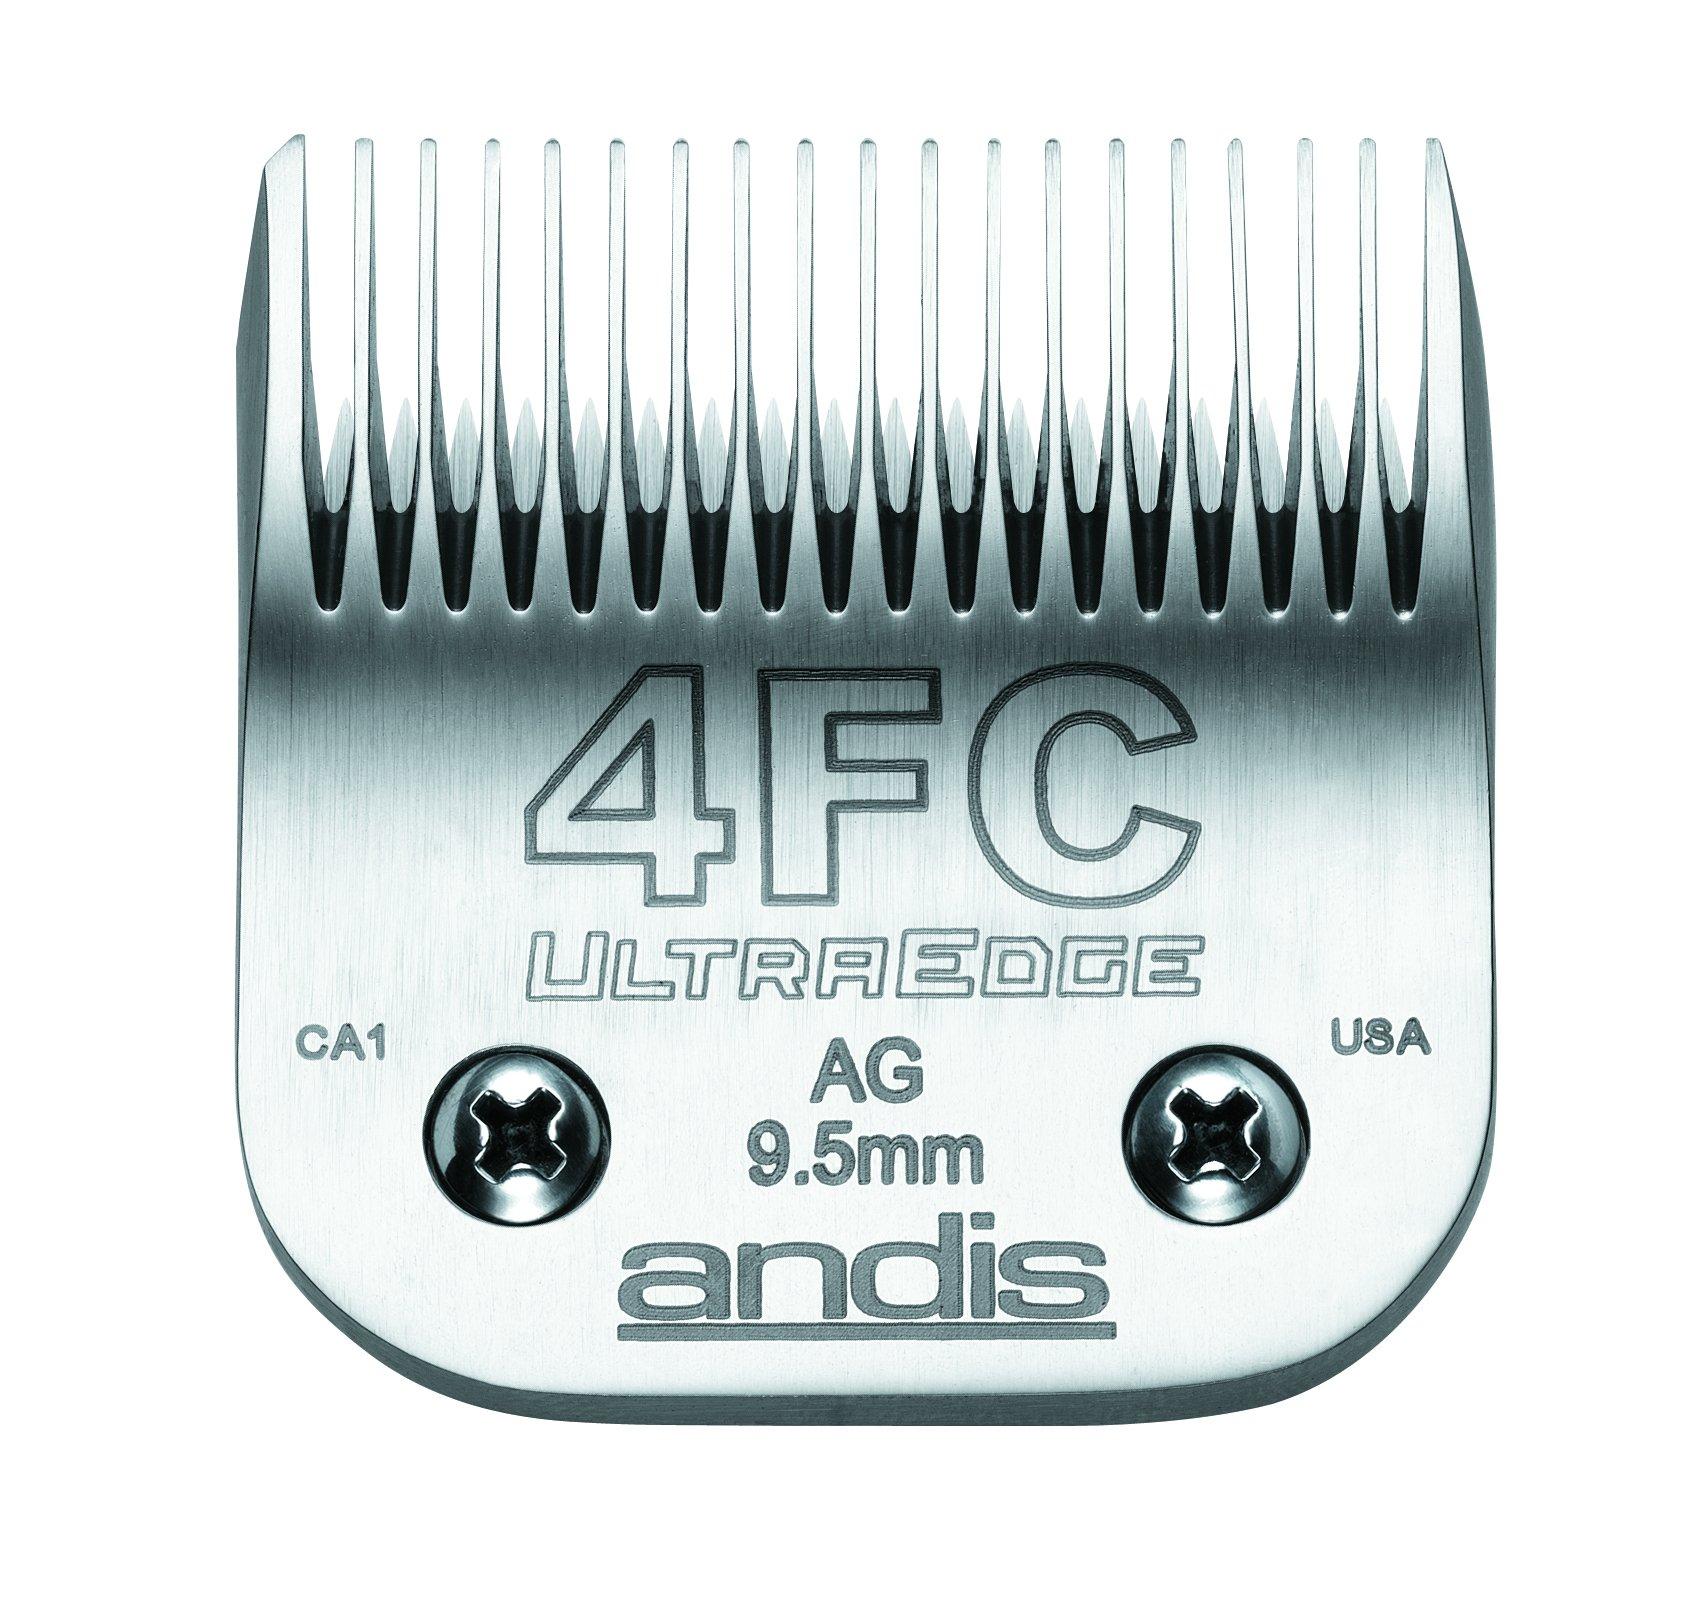 Cuchillas : Andis 4fc Ultra Edge 64123 Reemplazo